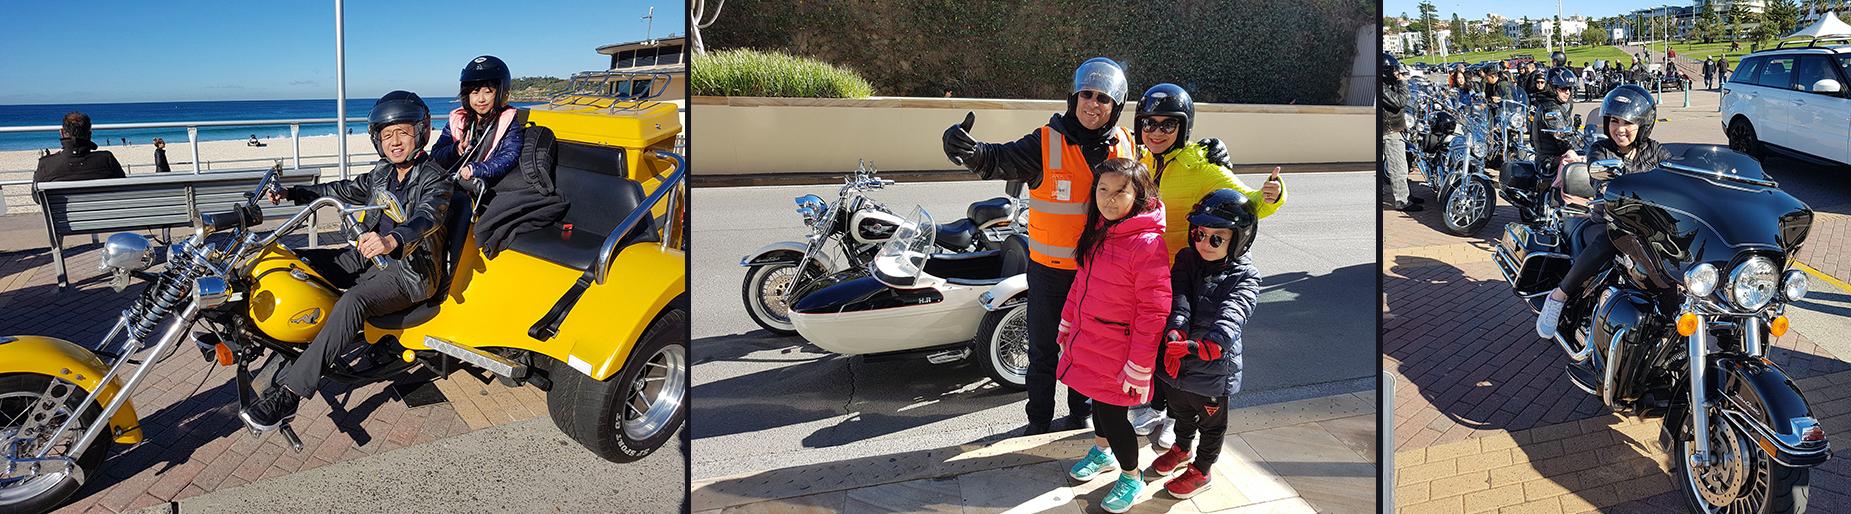 Harley tour Bondi Beach Sydney